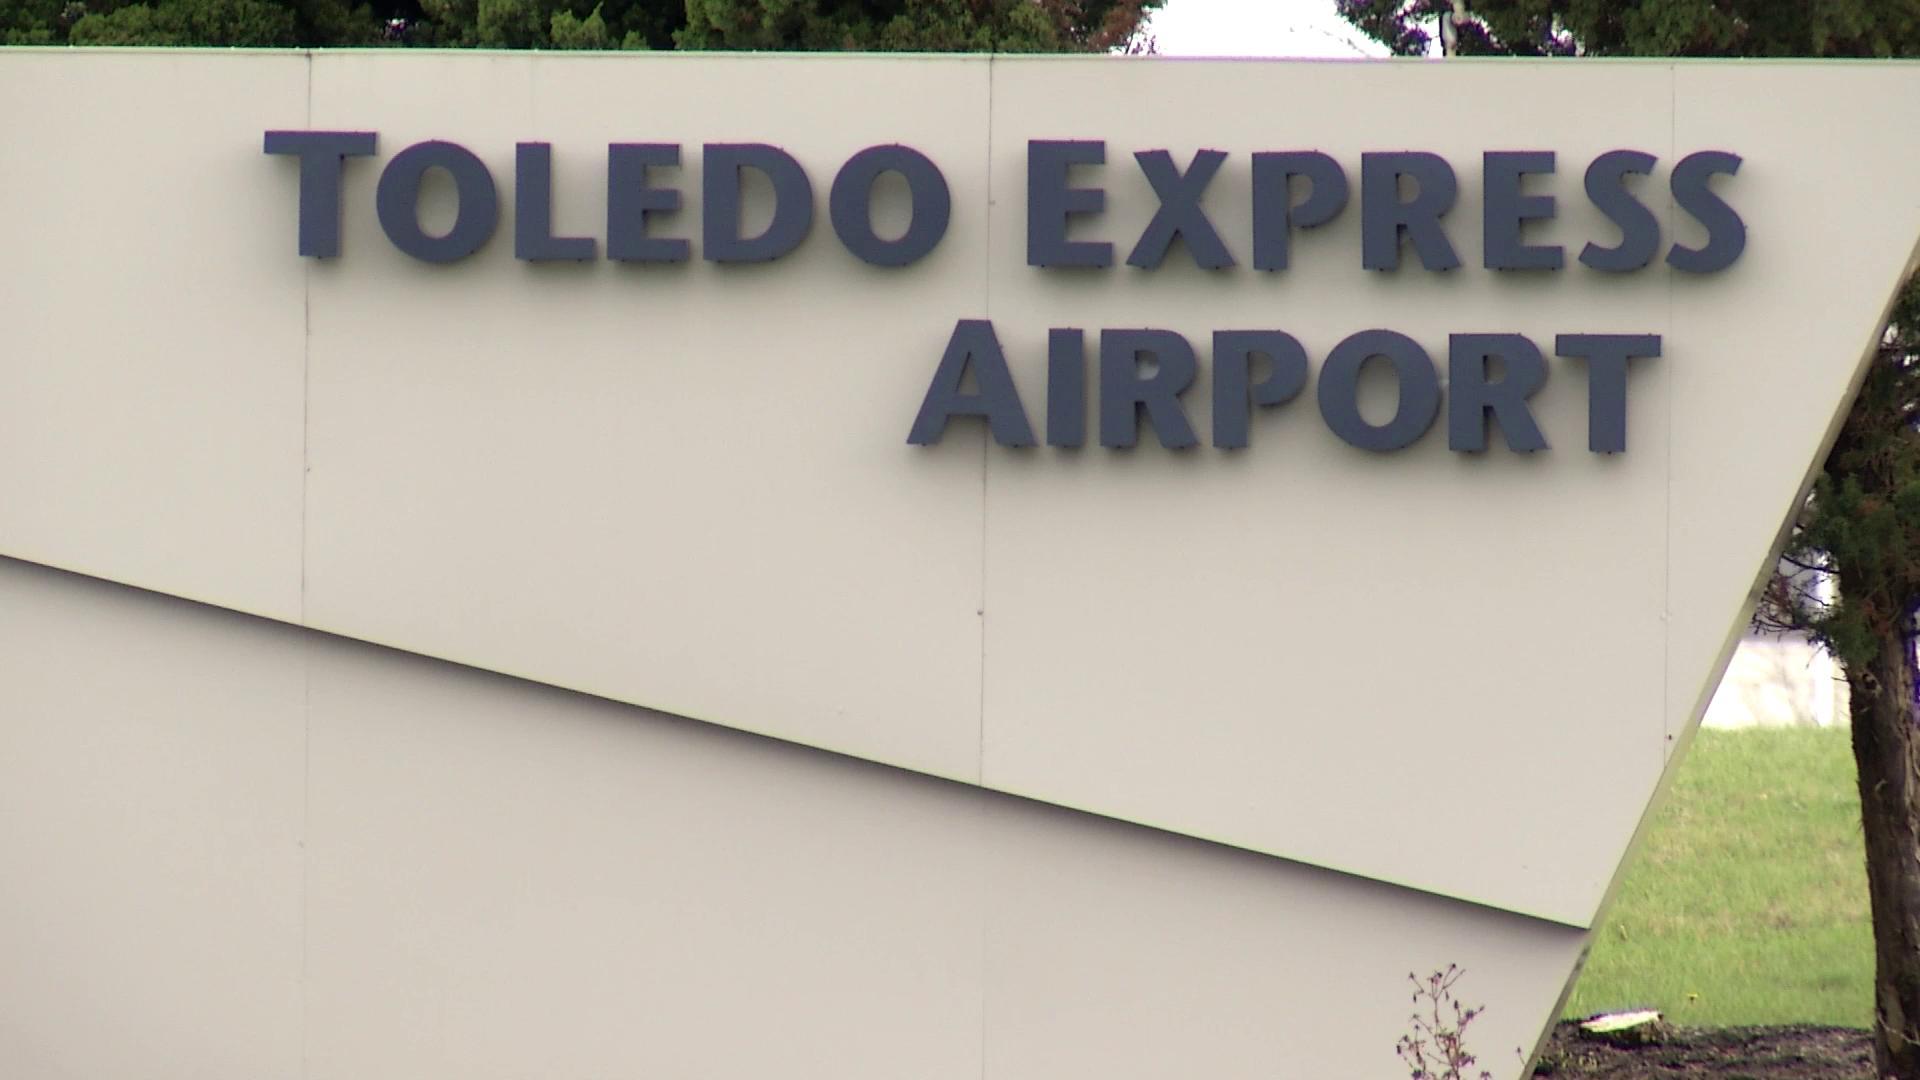 American Airlines increasing capacity at Toledo Express